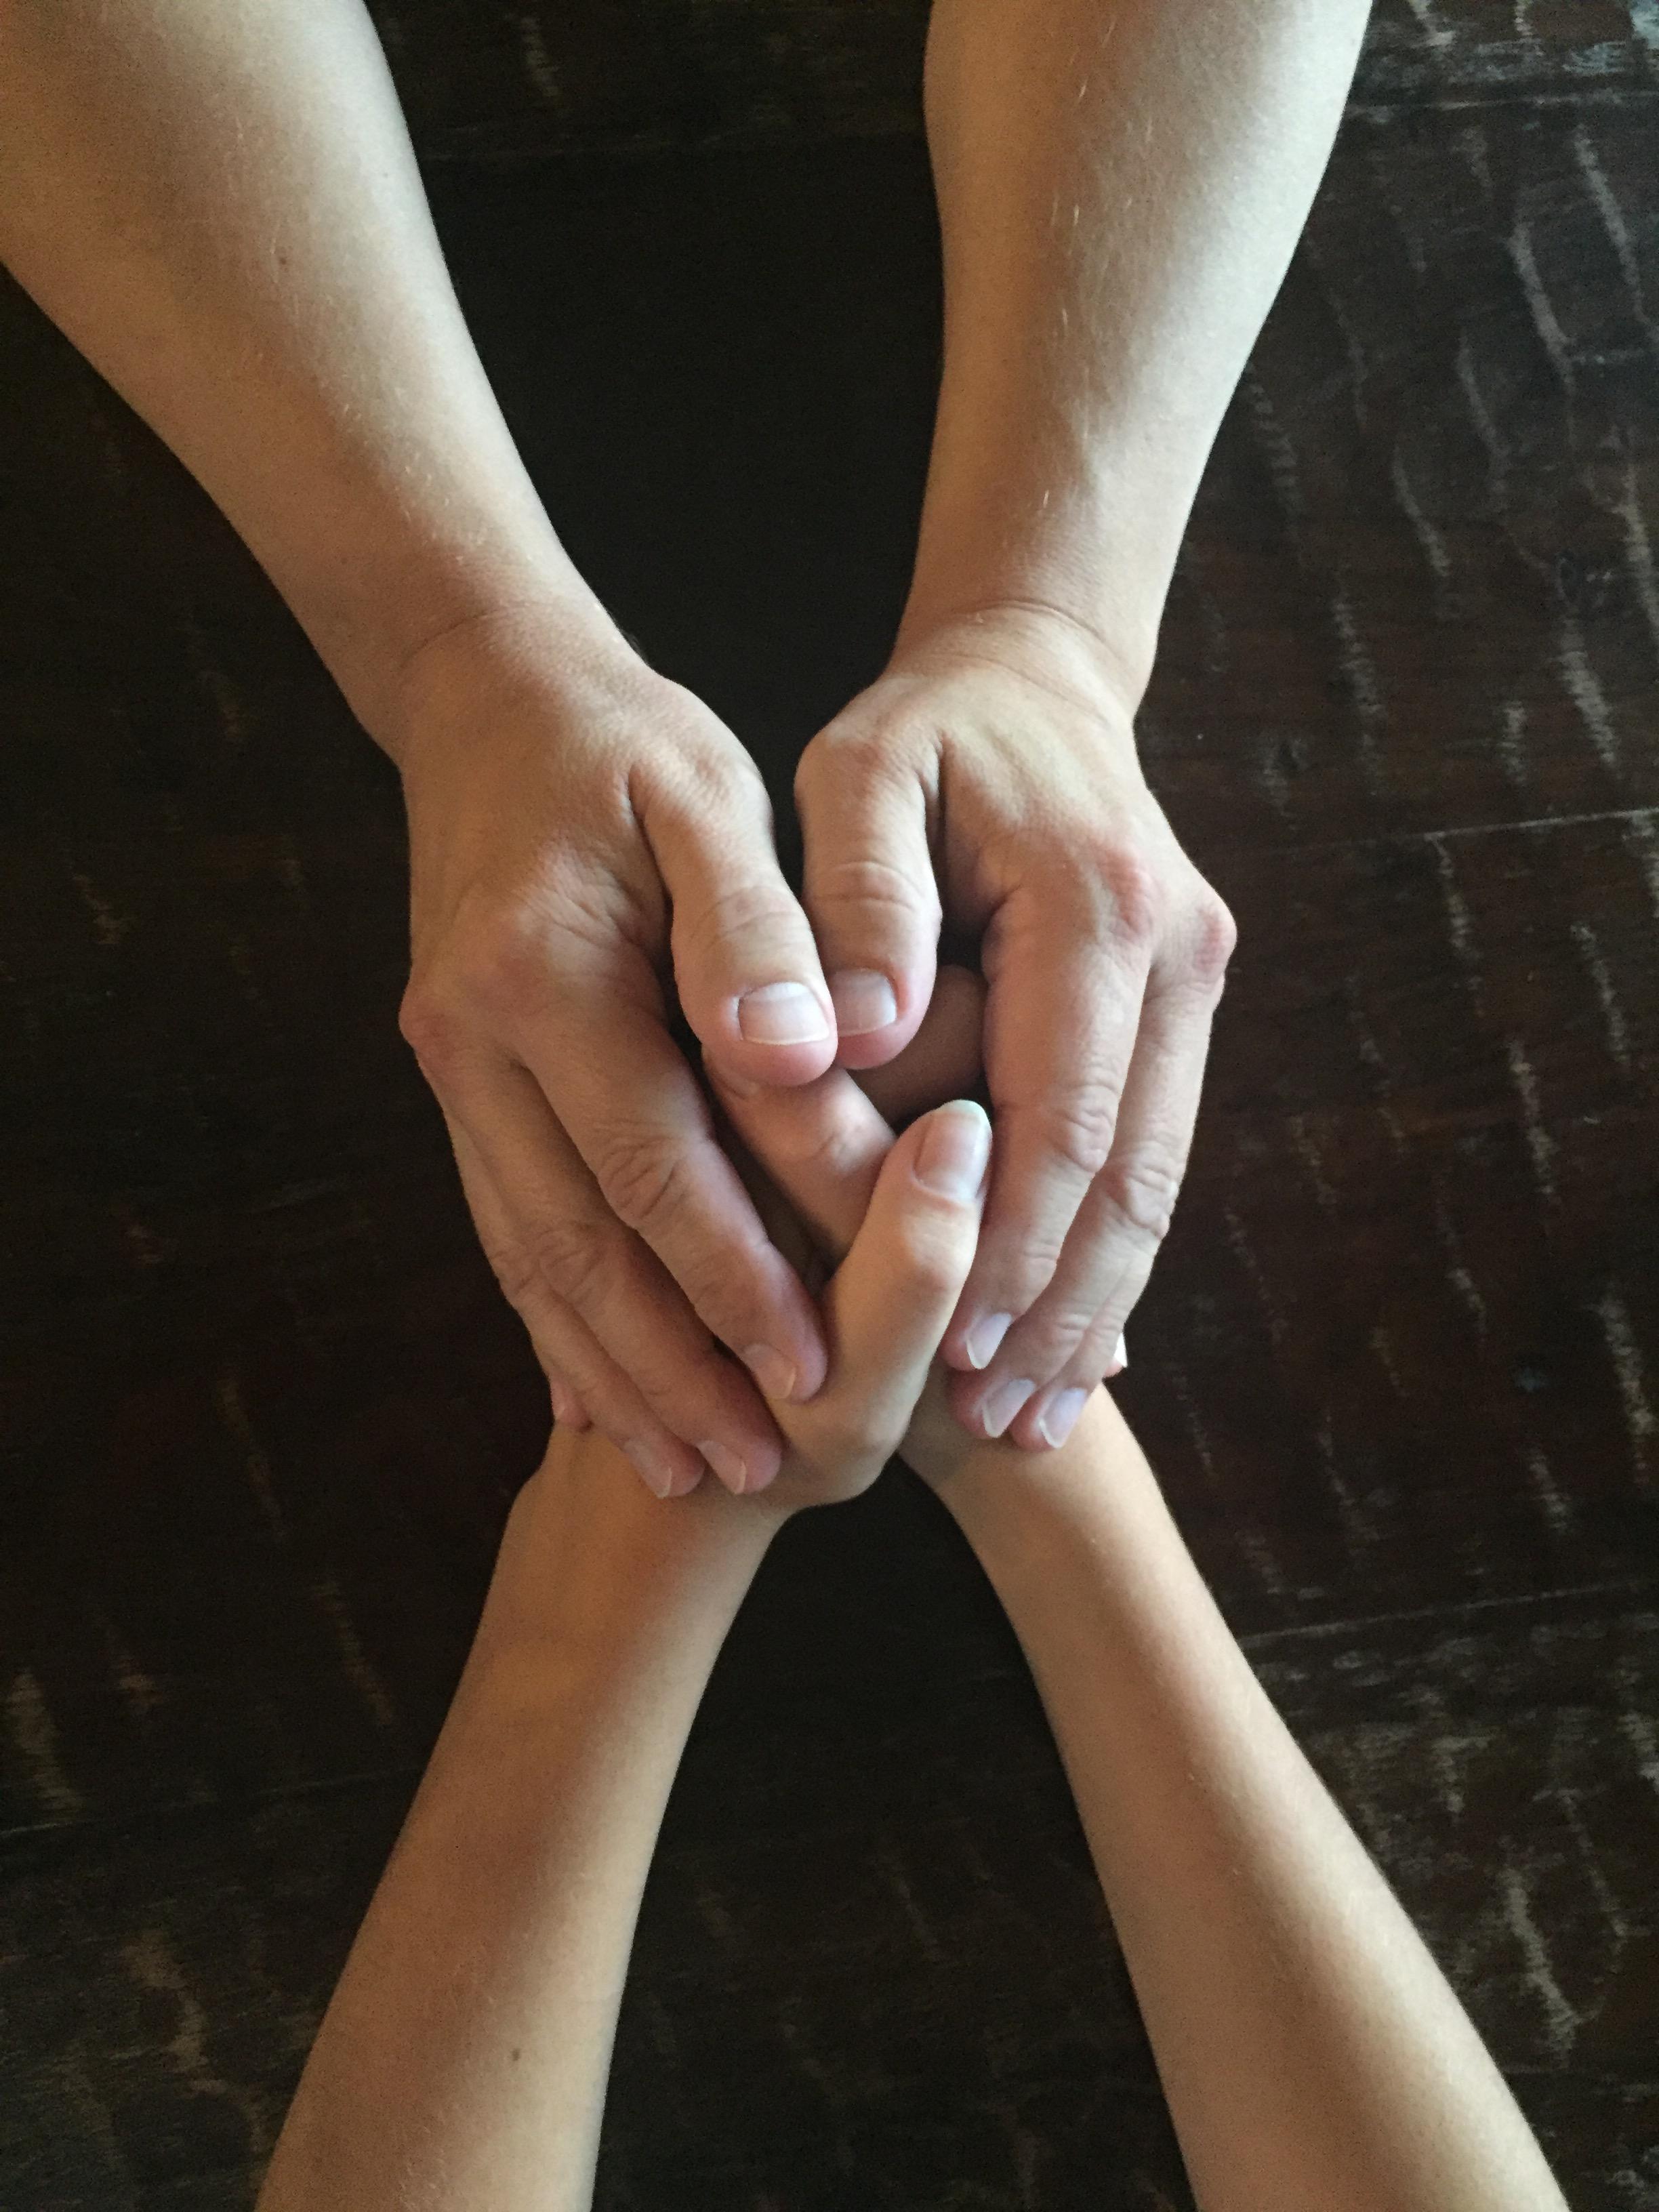 Prayer in Parenting